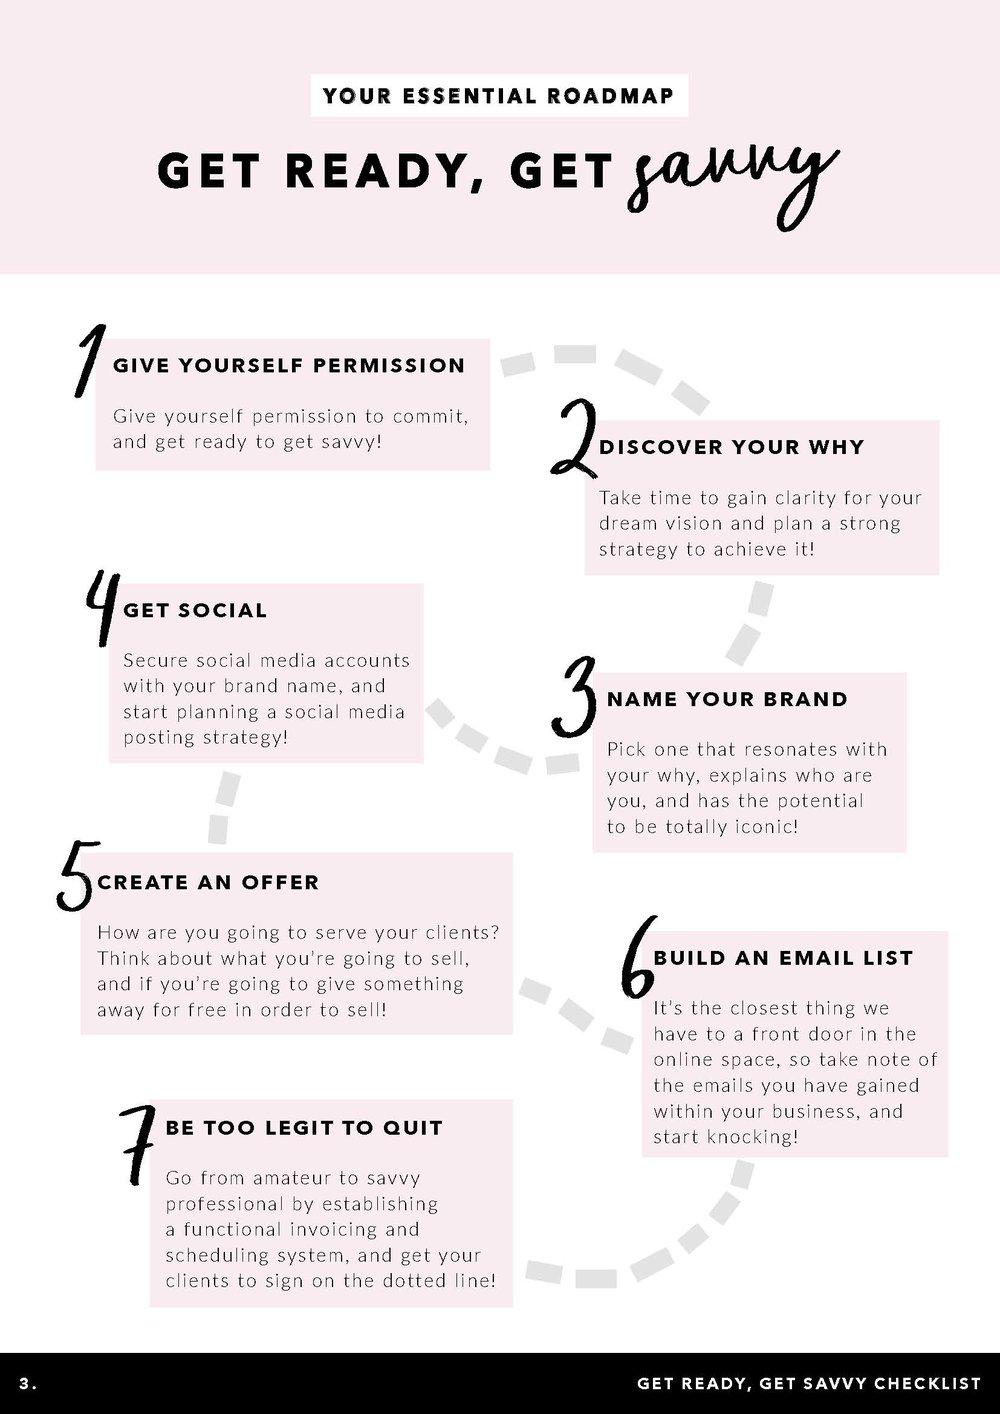 Get Ready Get Savvy Checklist by Studio179_Page_3.jpg